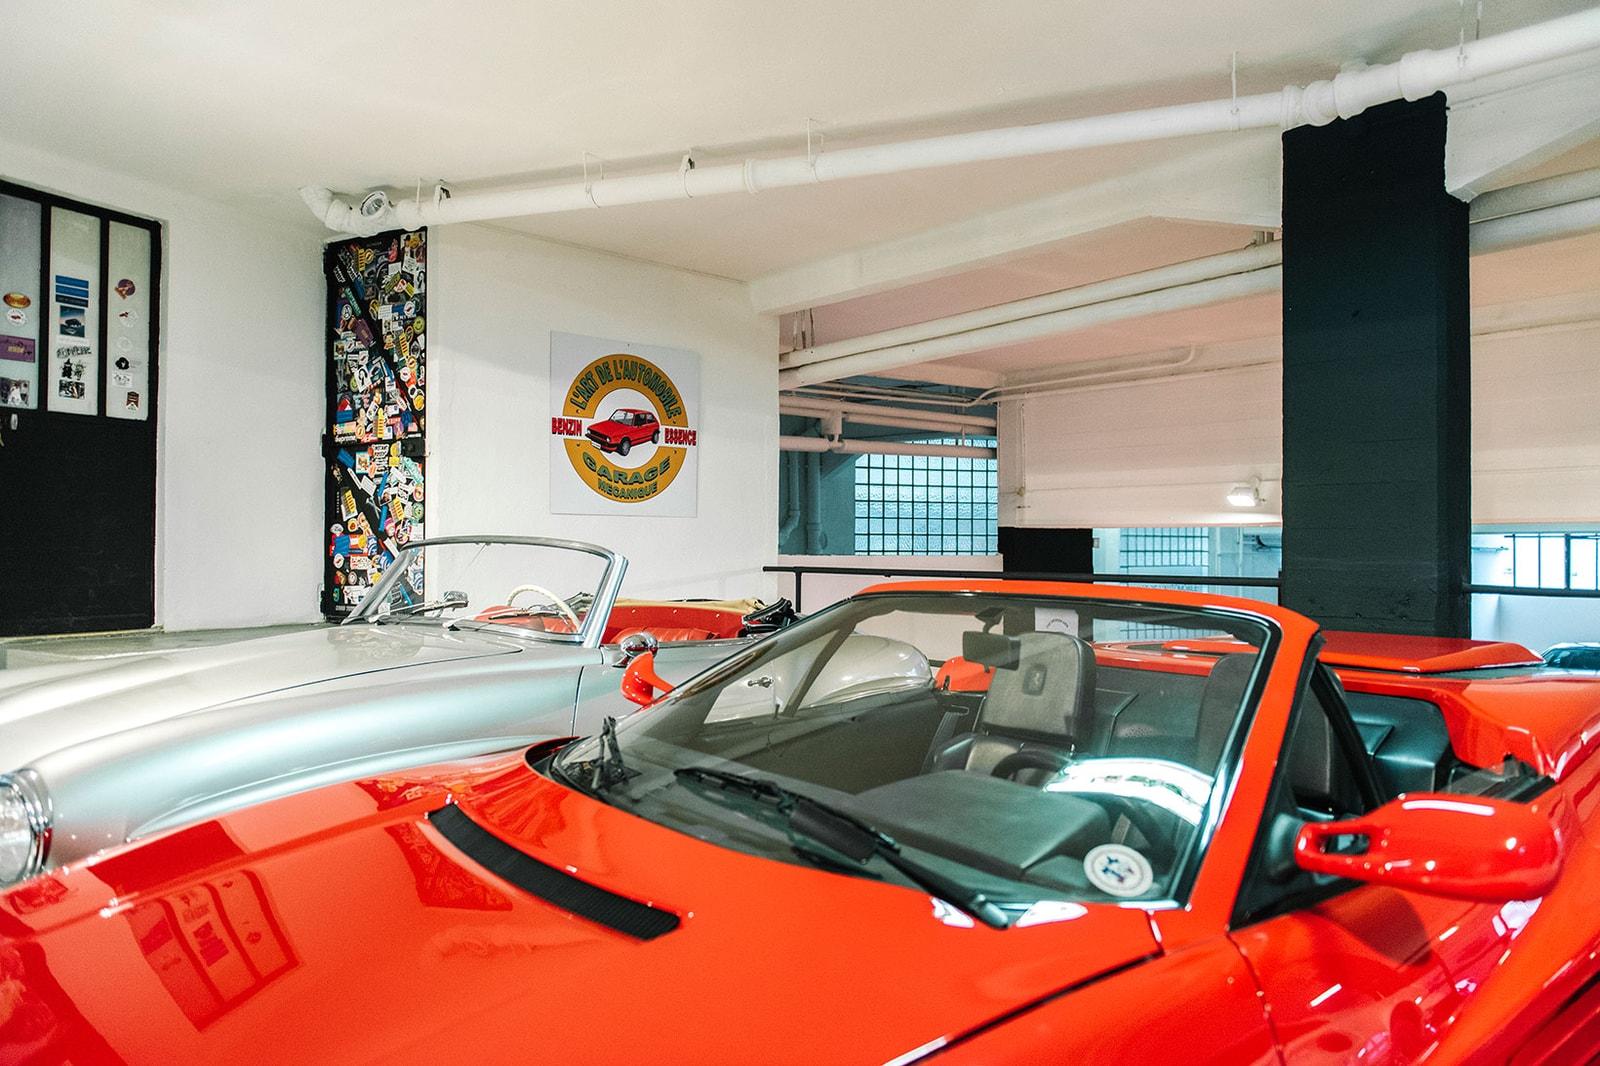 Arthur Kar L'art de L'automobile Volkswagen Golf GTI Paris Hypebeast Radio